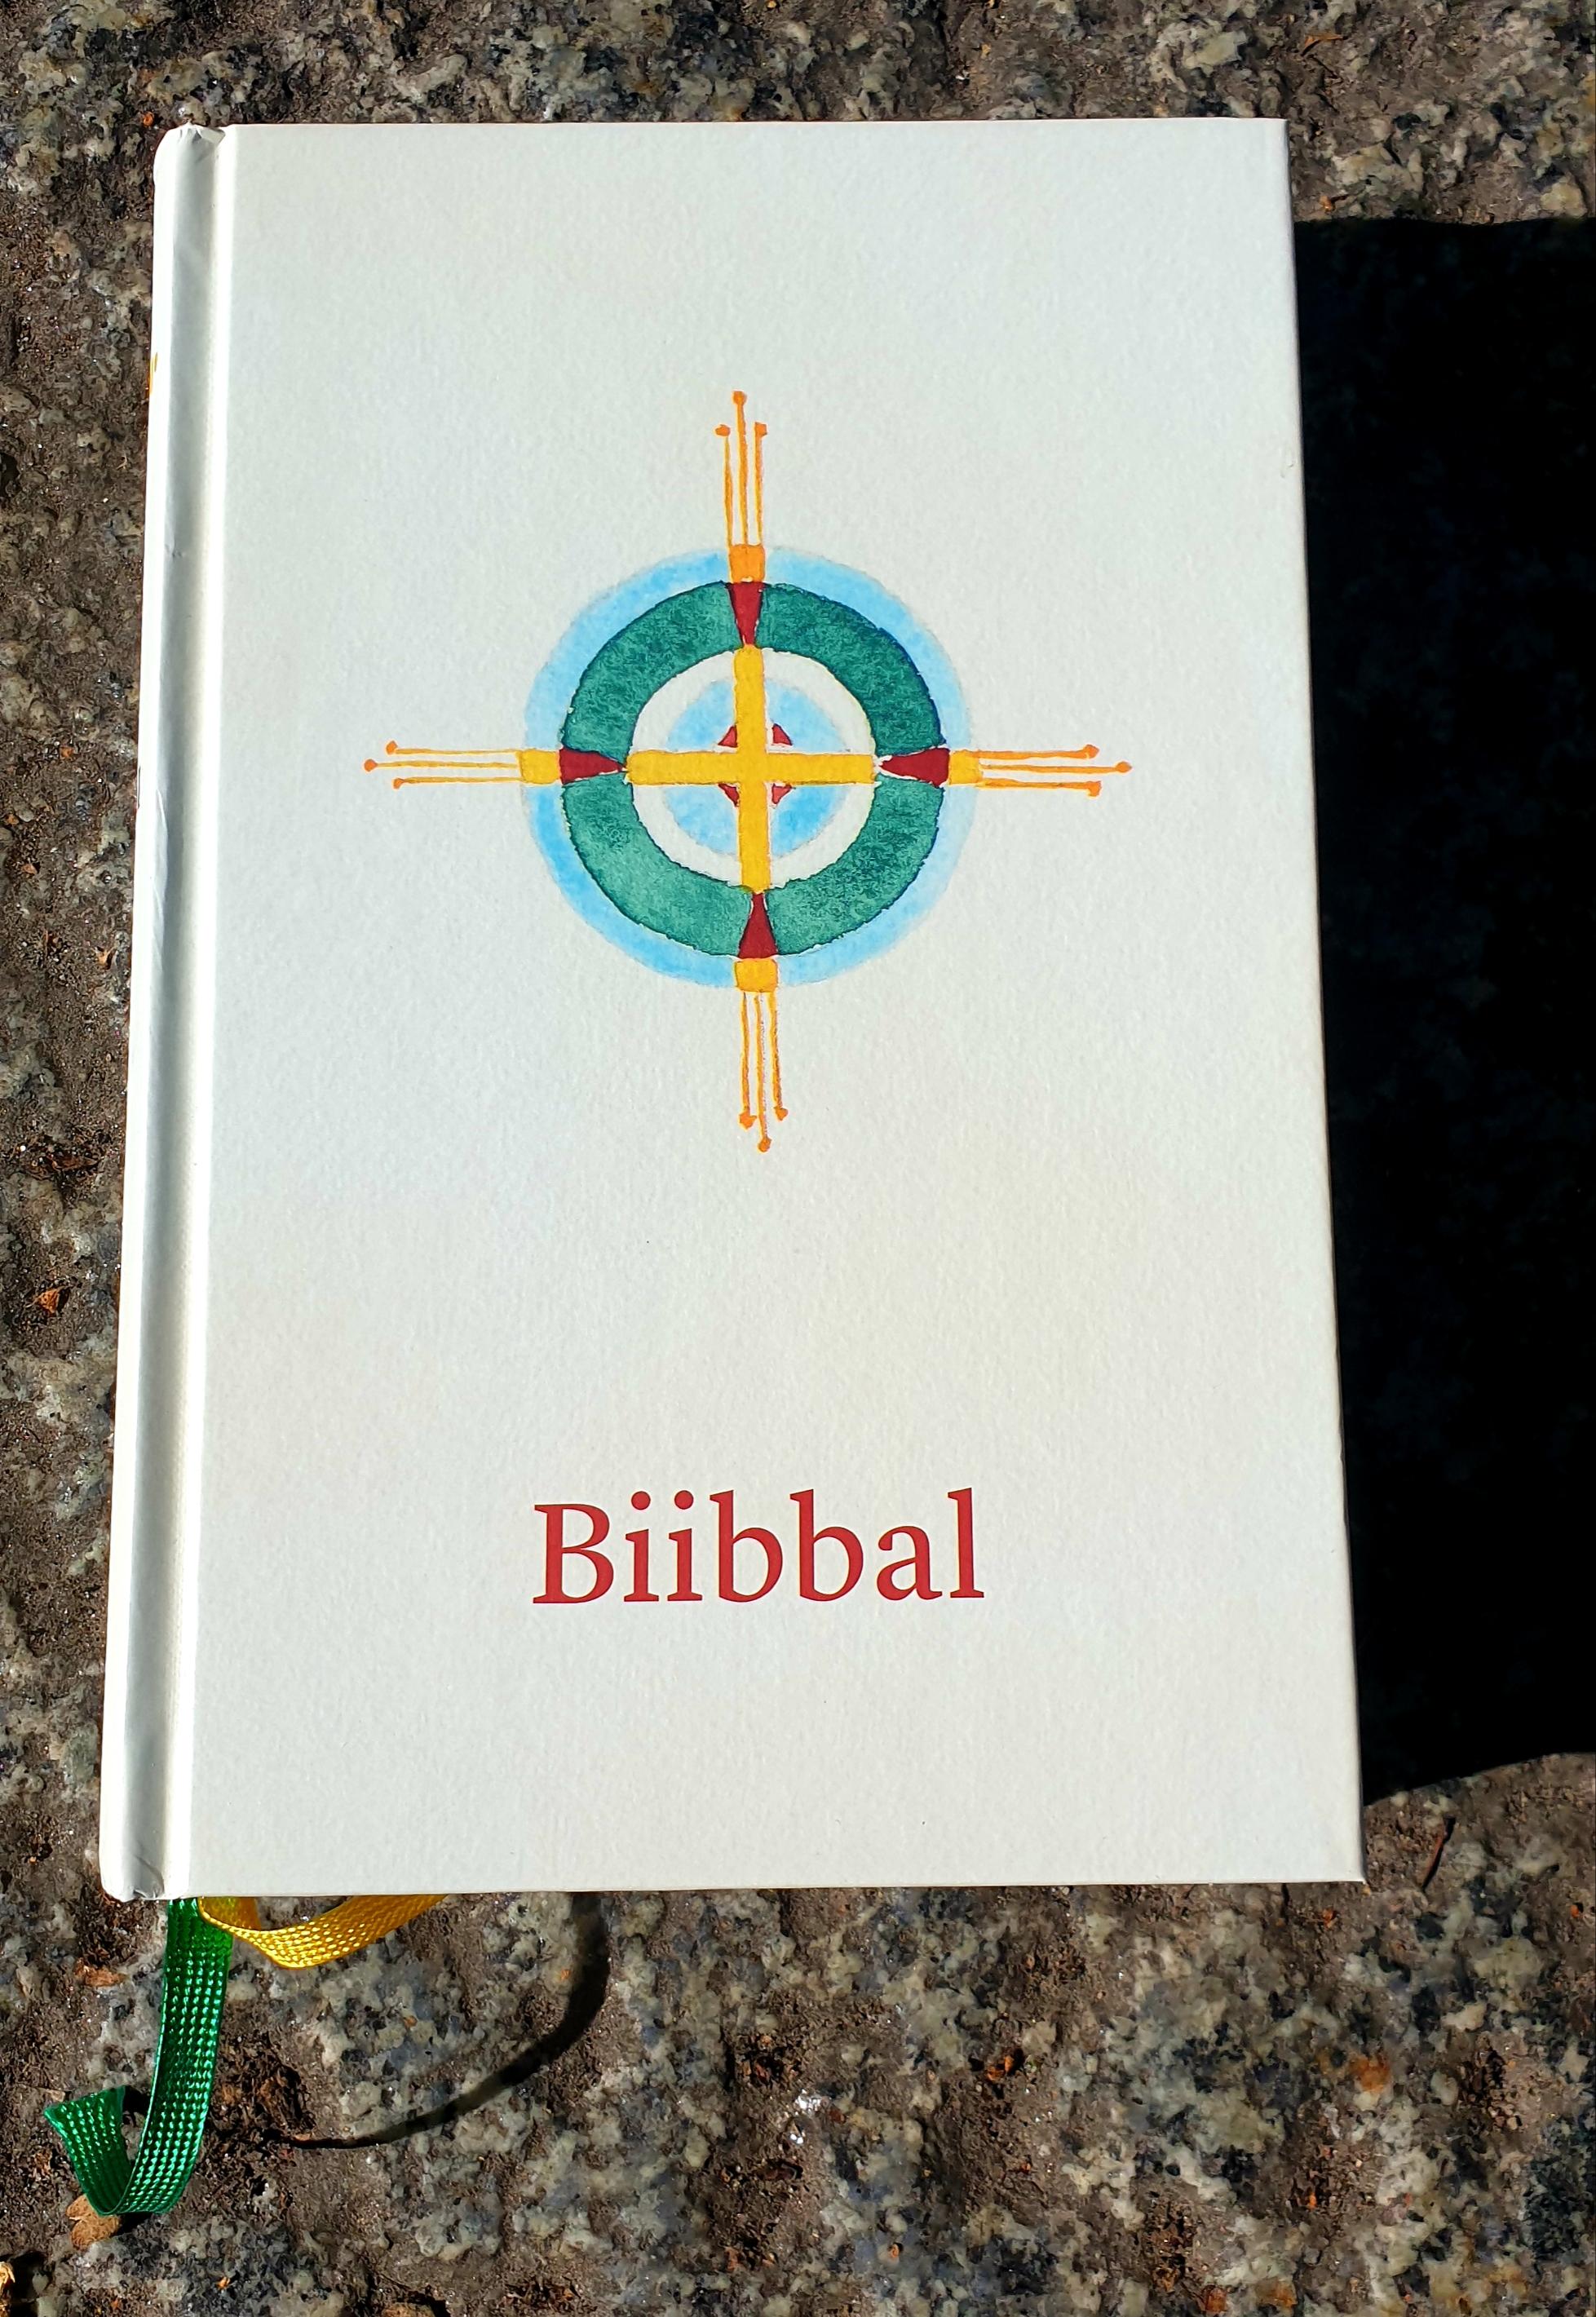 Biibbal2019 via bibelbutiken